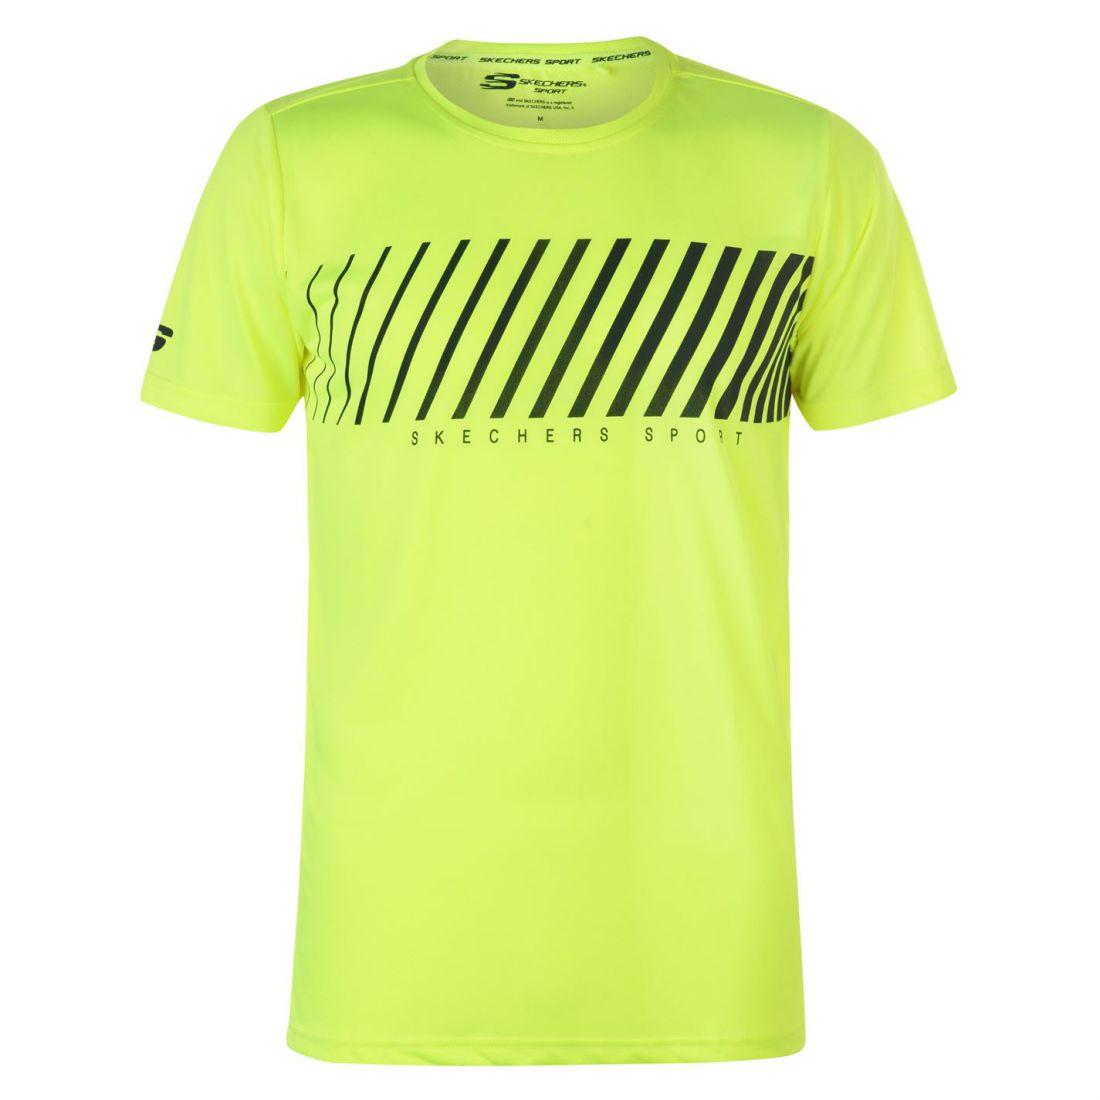 Skechers-Mens-Rendimiento-Grafico-camiseta-Manga-Corta-Camiseta-Top-Cuello-Redondo miniatura 14